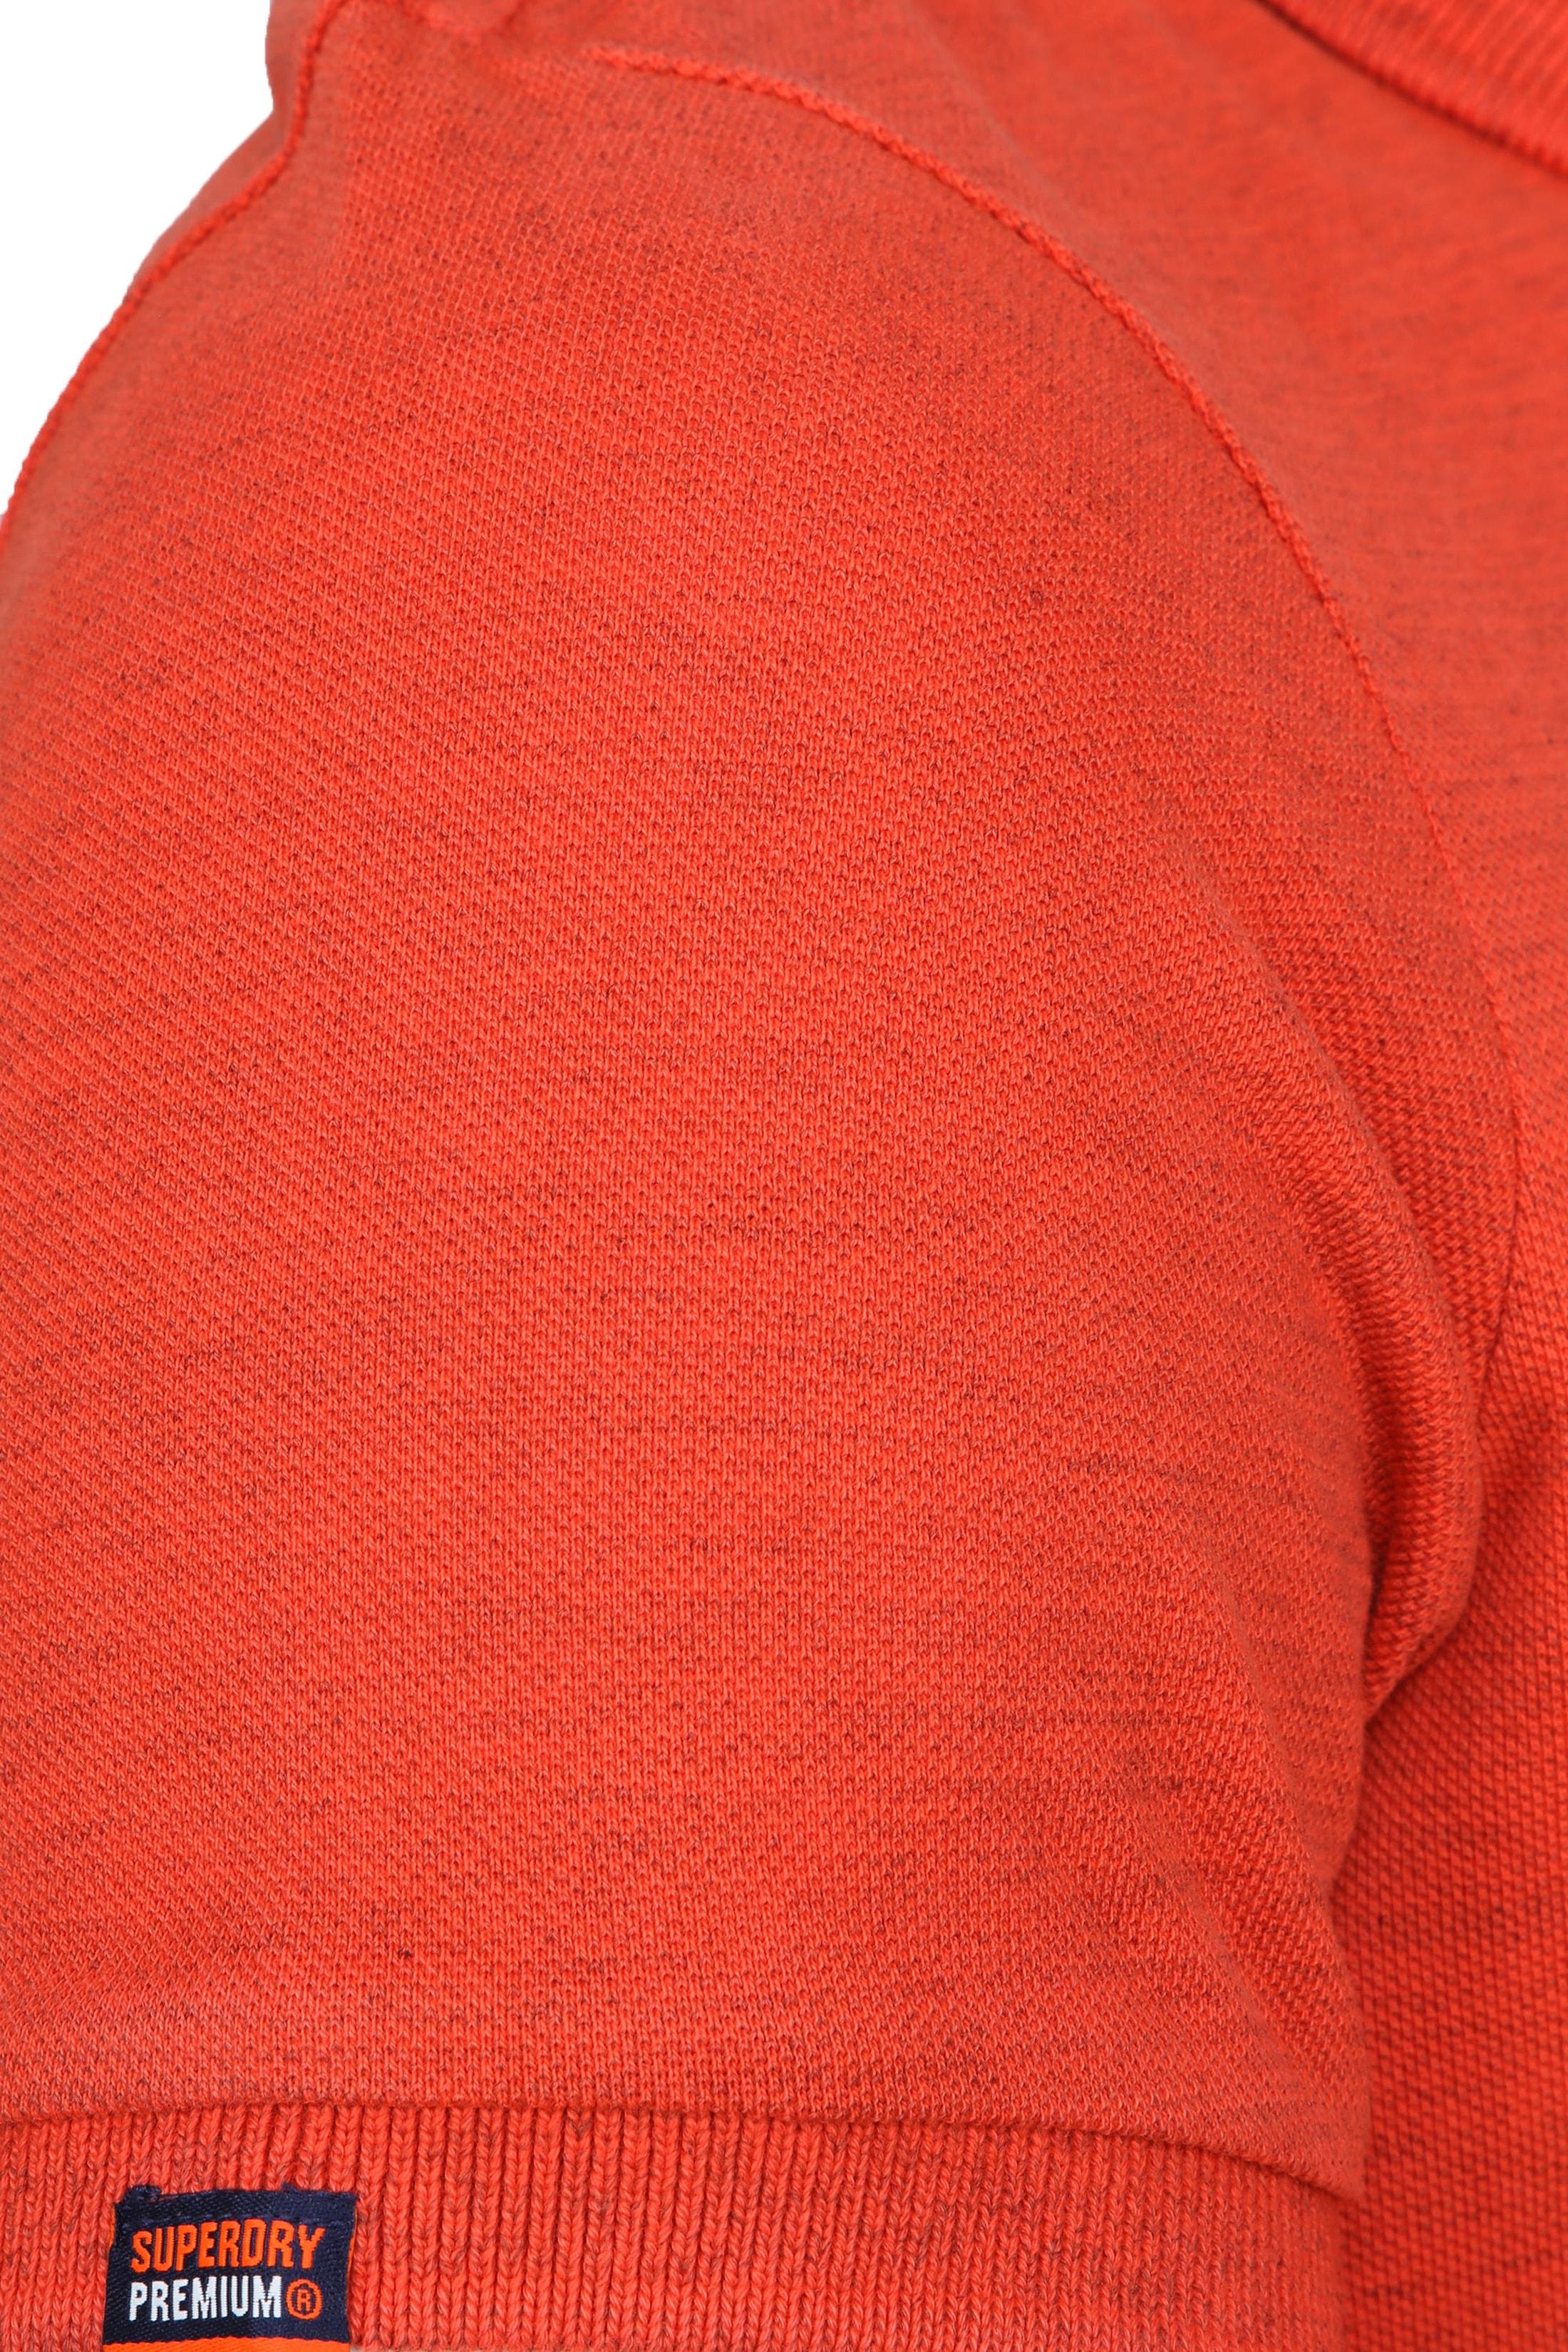 Superdry Premium Poloshirt Orange foto 3